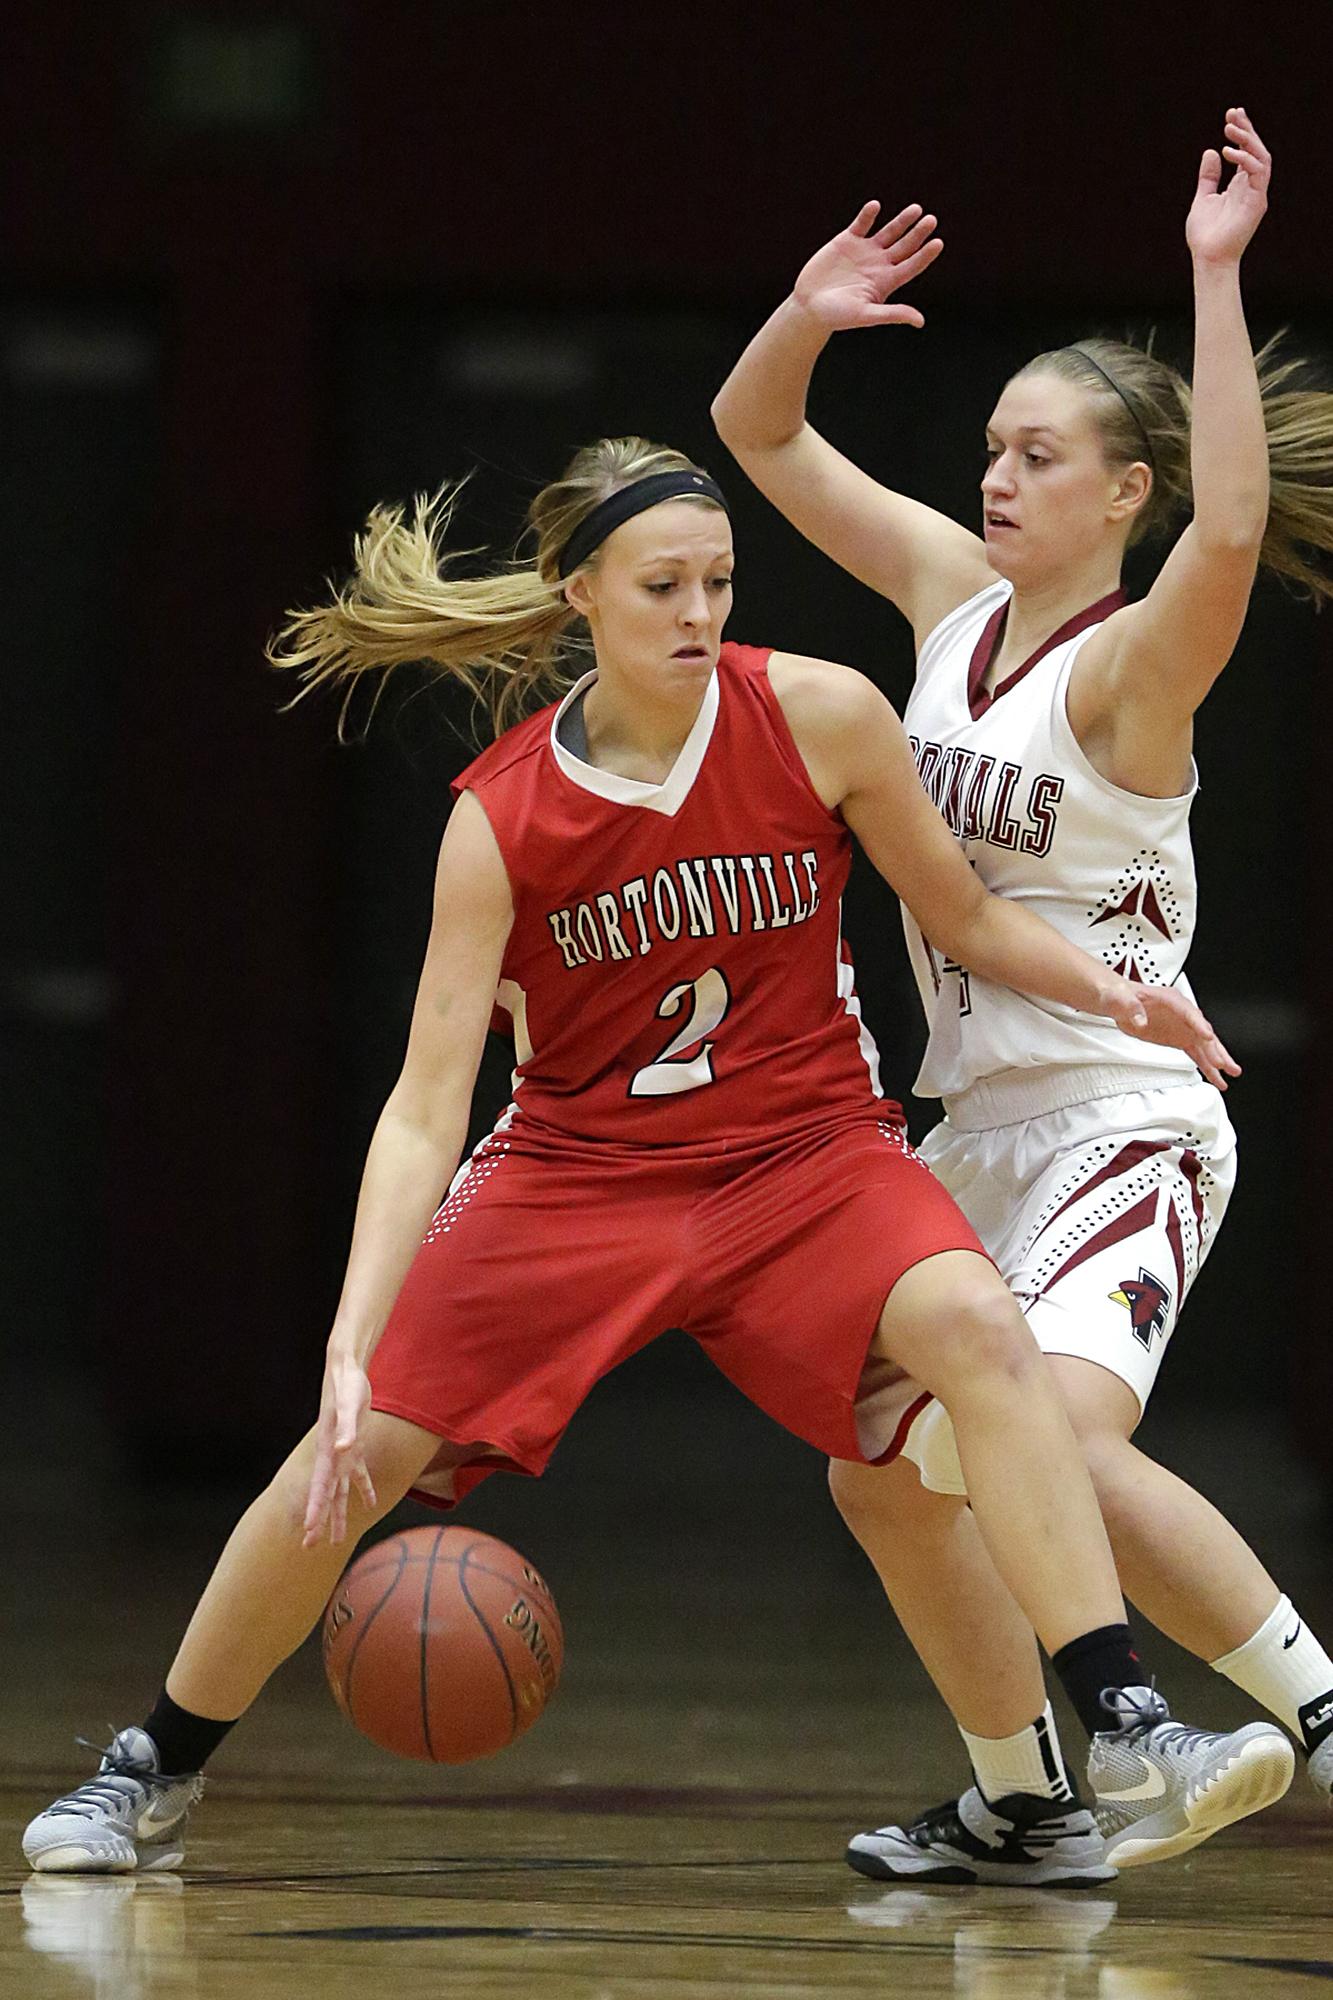 WIAA girls' basketball: Hortonville vs. New London on ...